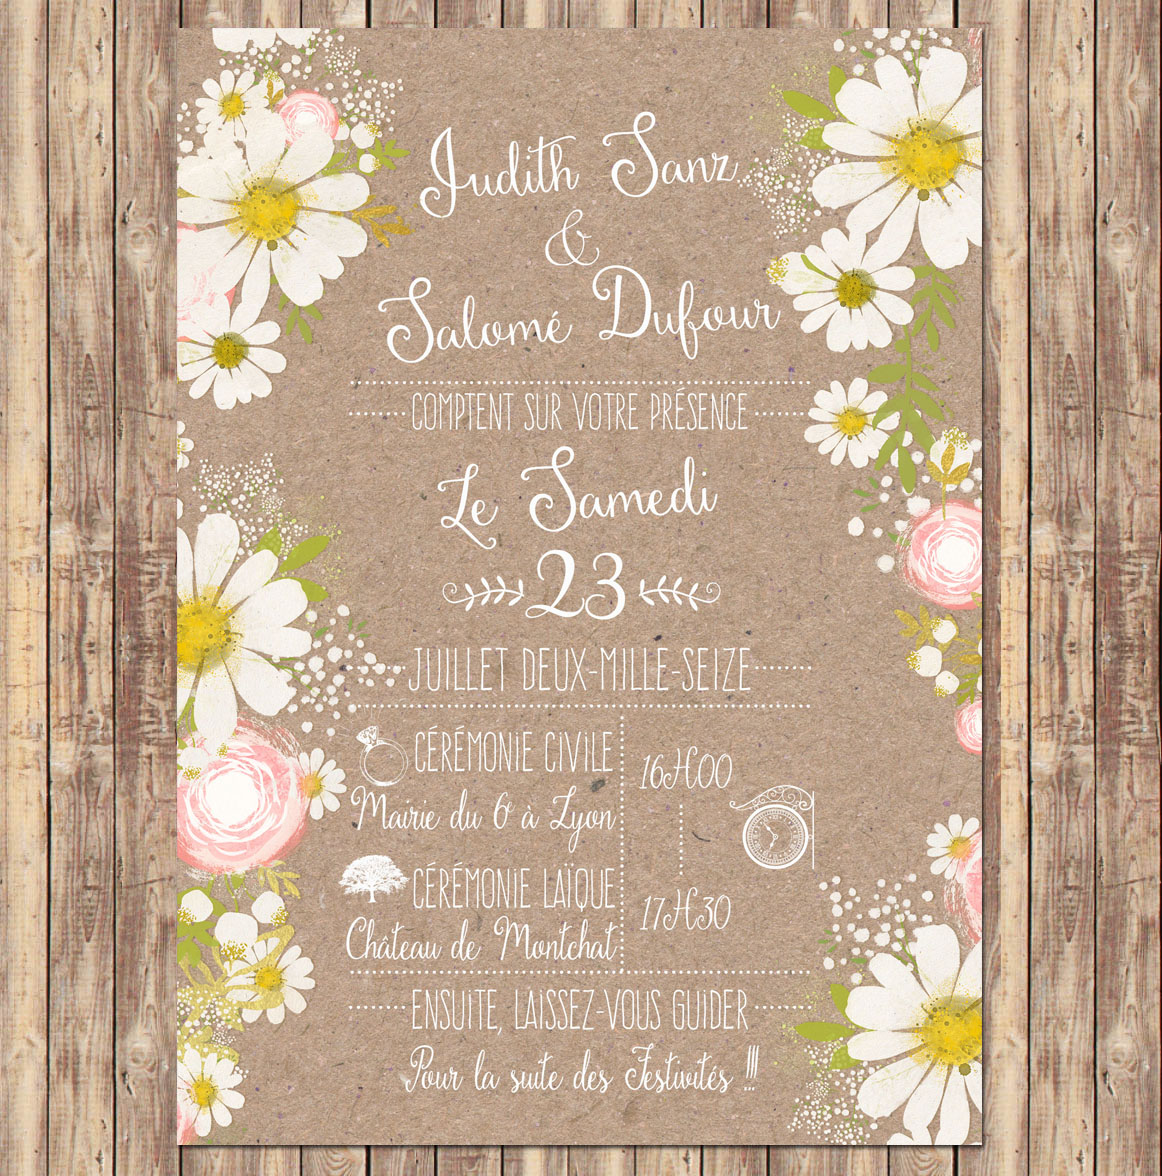 invitation mariage fleurs avec d clinaisons selon th me. Black Bedroom Furniture Sets. Home Design Ideas